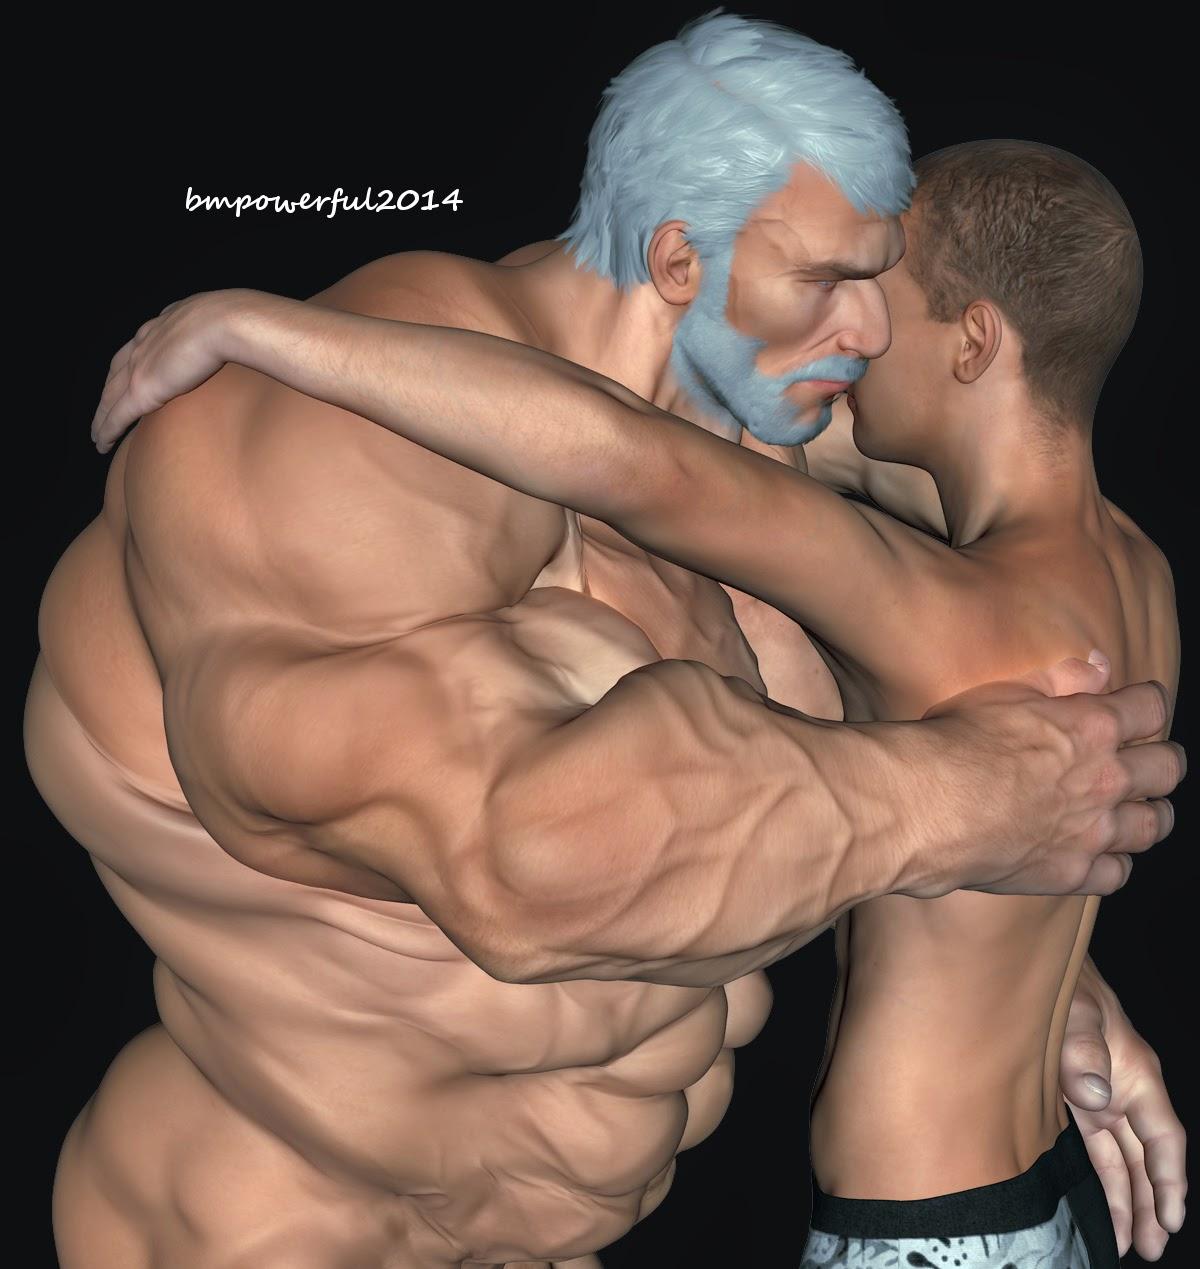 escortsbologna gay bodybuilder escort